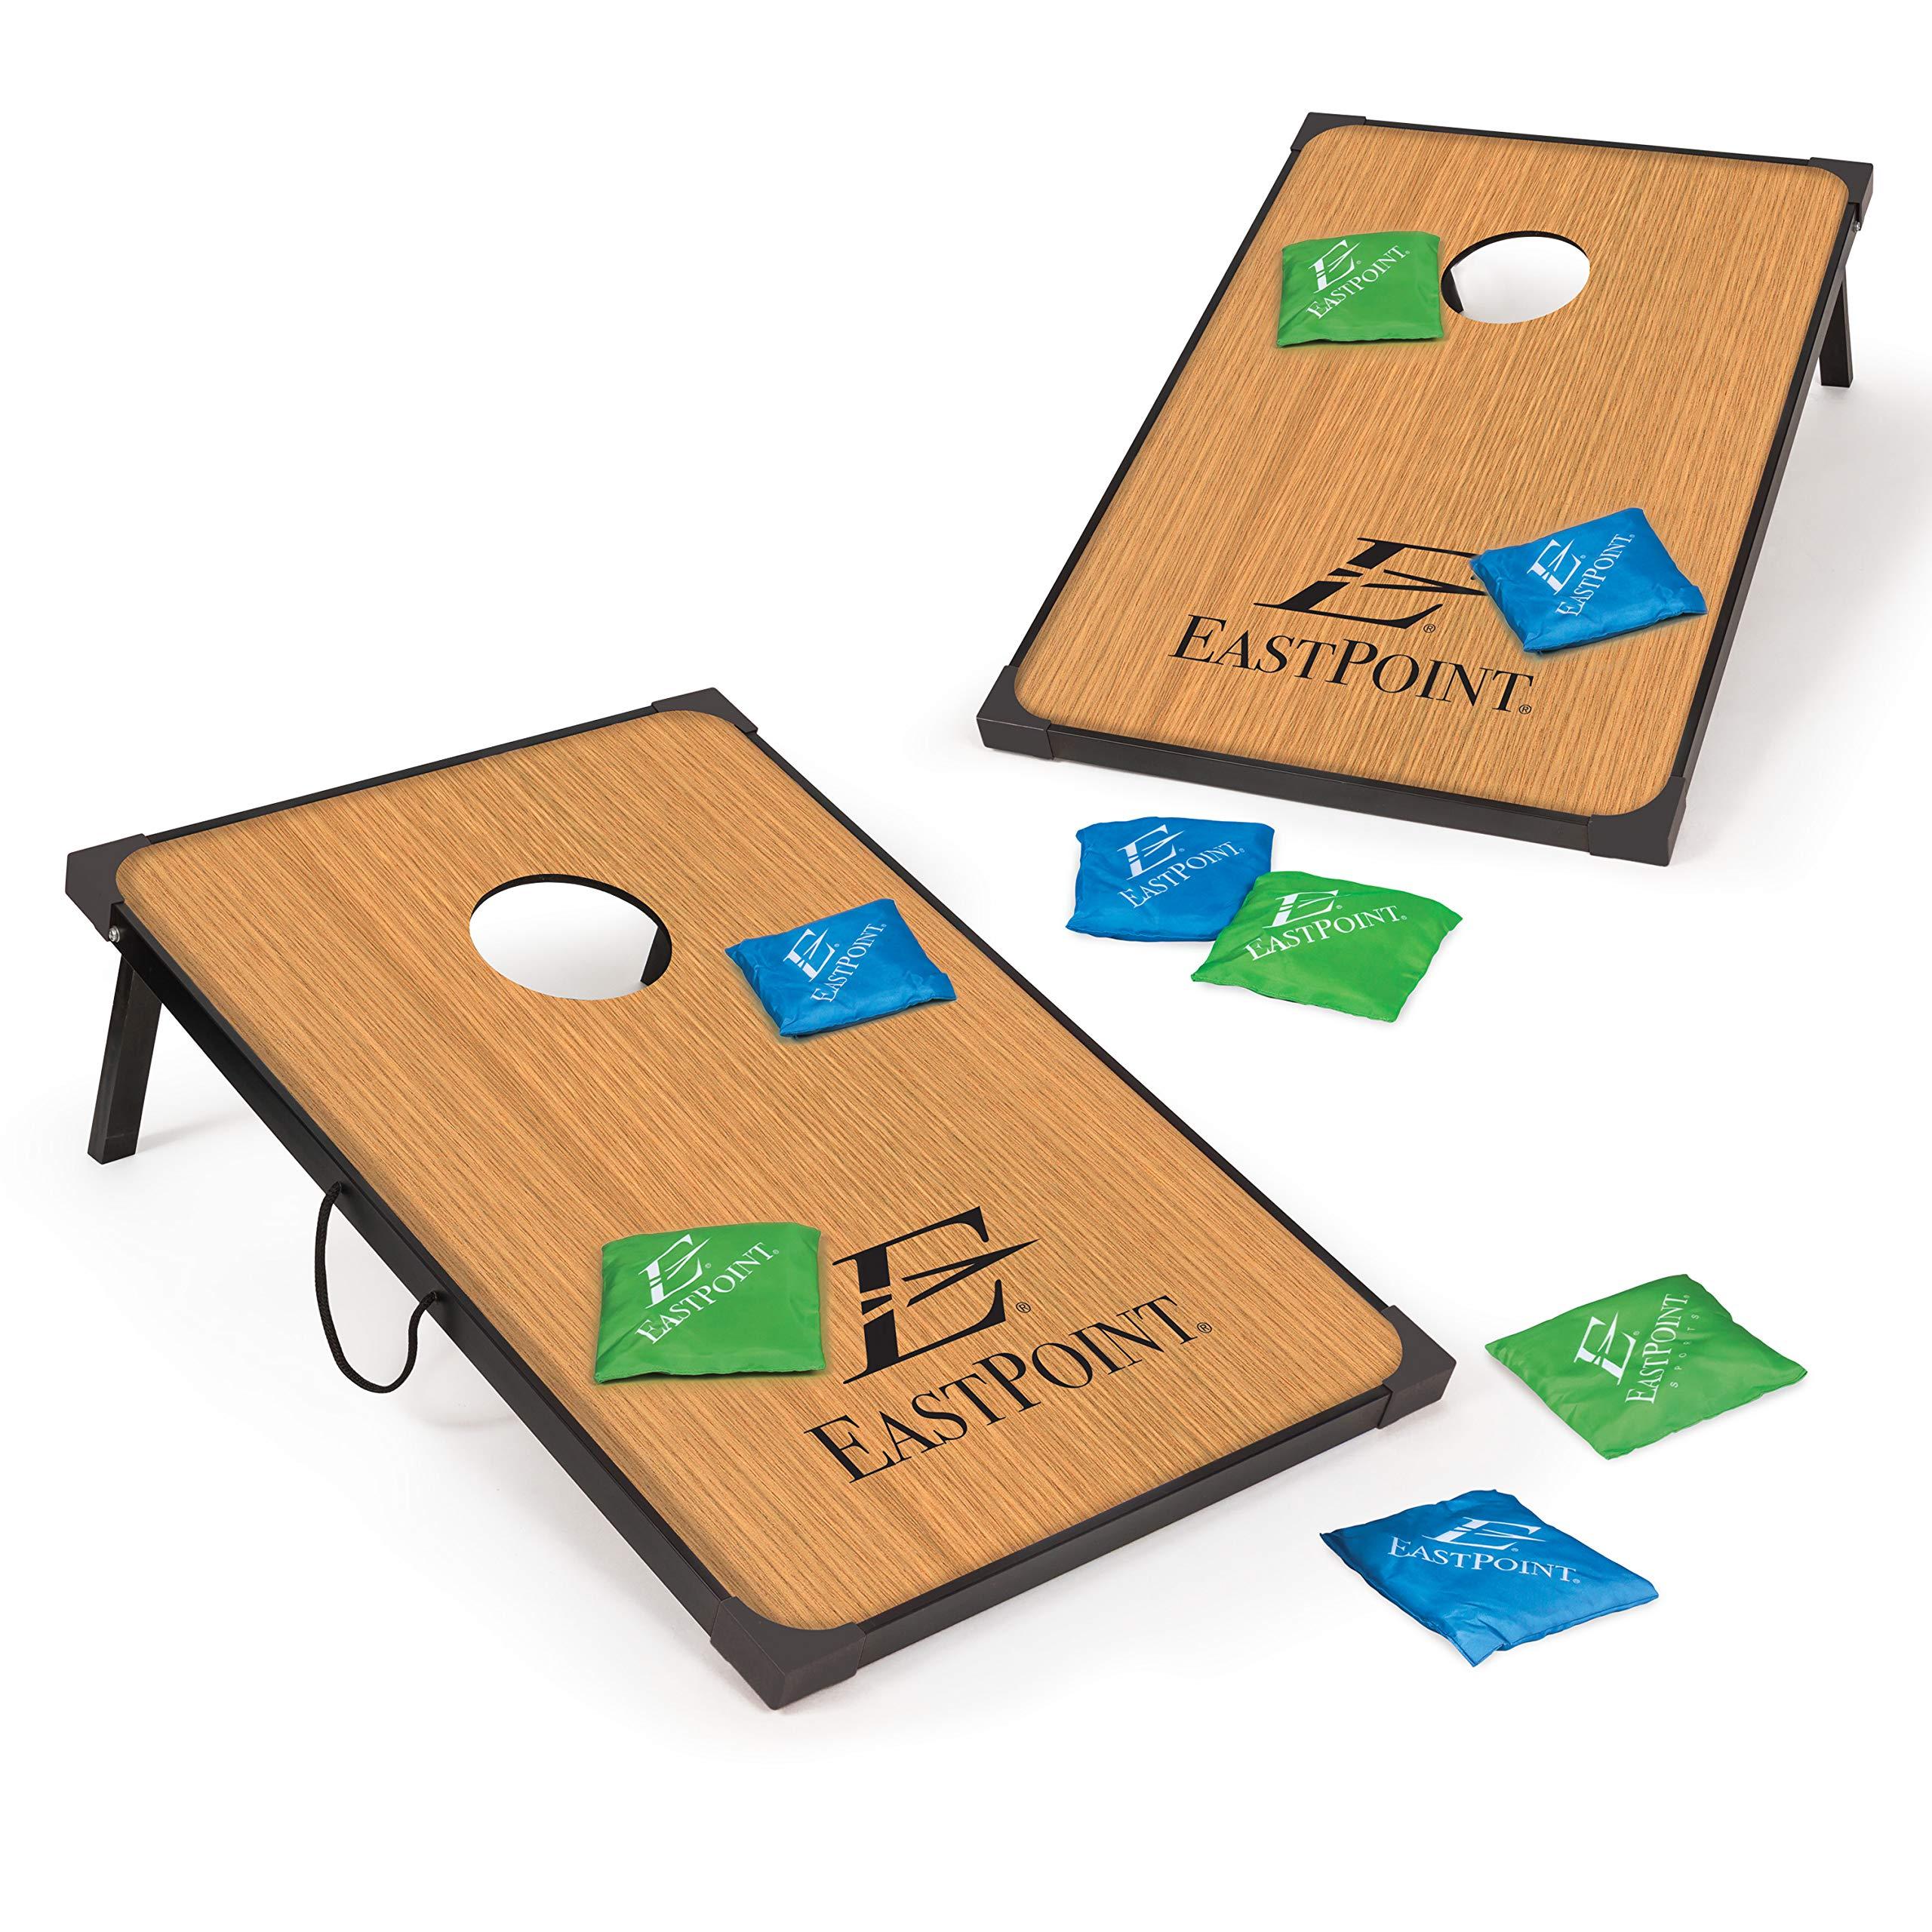 Magnificent Details About Tournament Bean Bag Toss Cornhole Bbq Game Set Boards Tailgate Regulation Size Theyellowbook Wood Chair Design Ideas Theyellowbookinfo